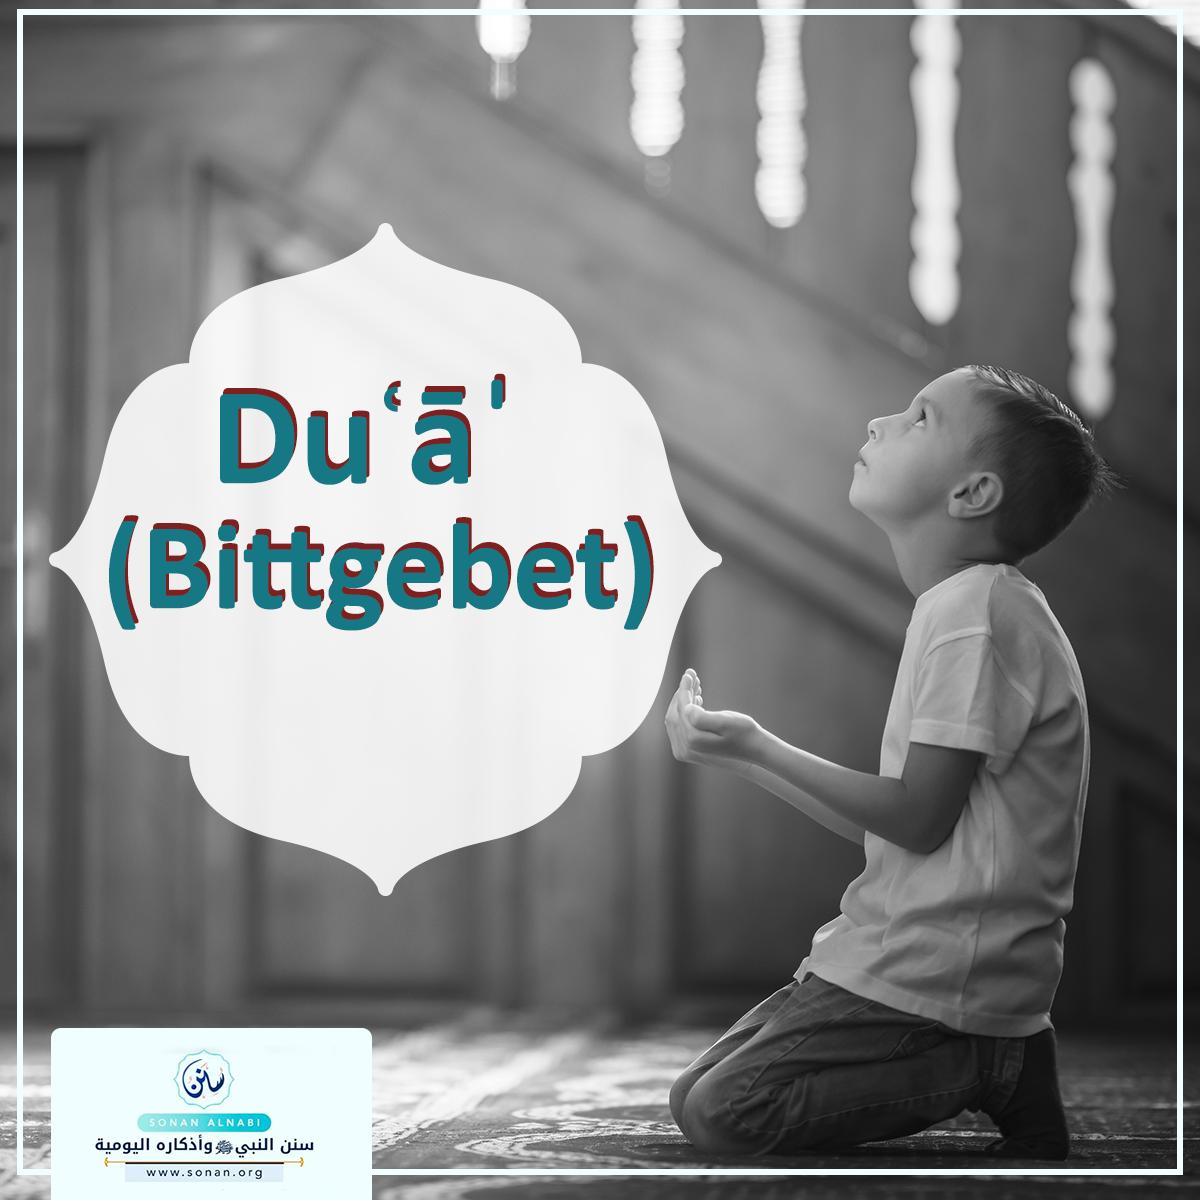 Duʿāˈ (Bittgebet)